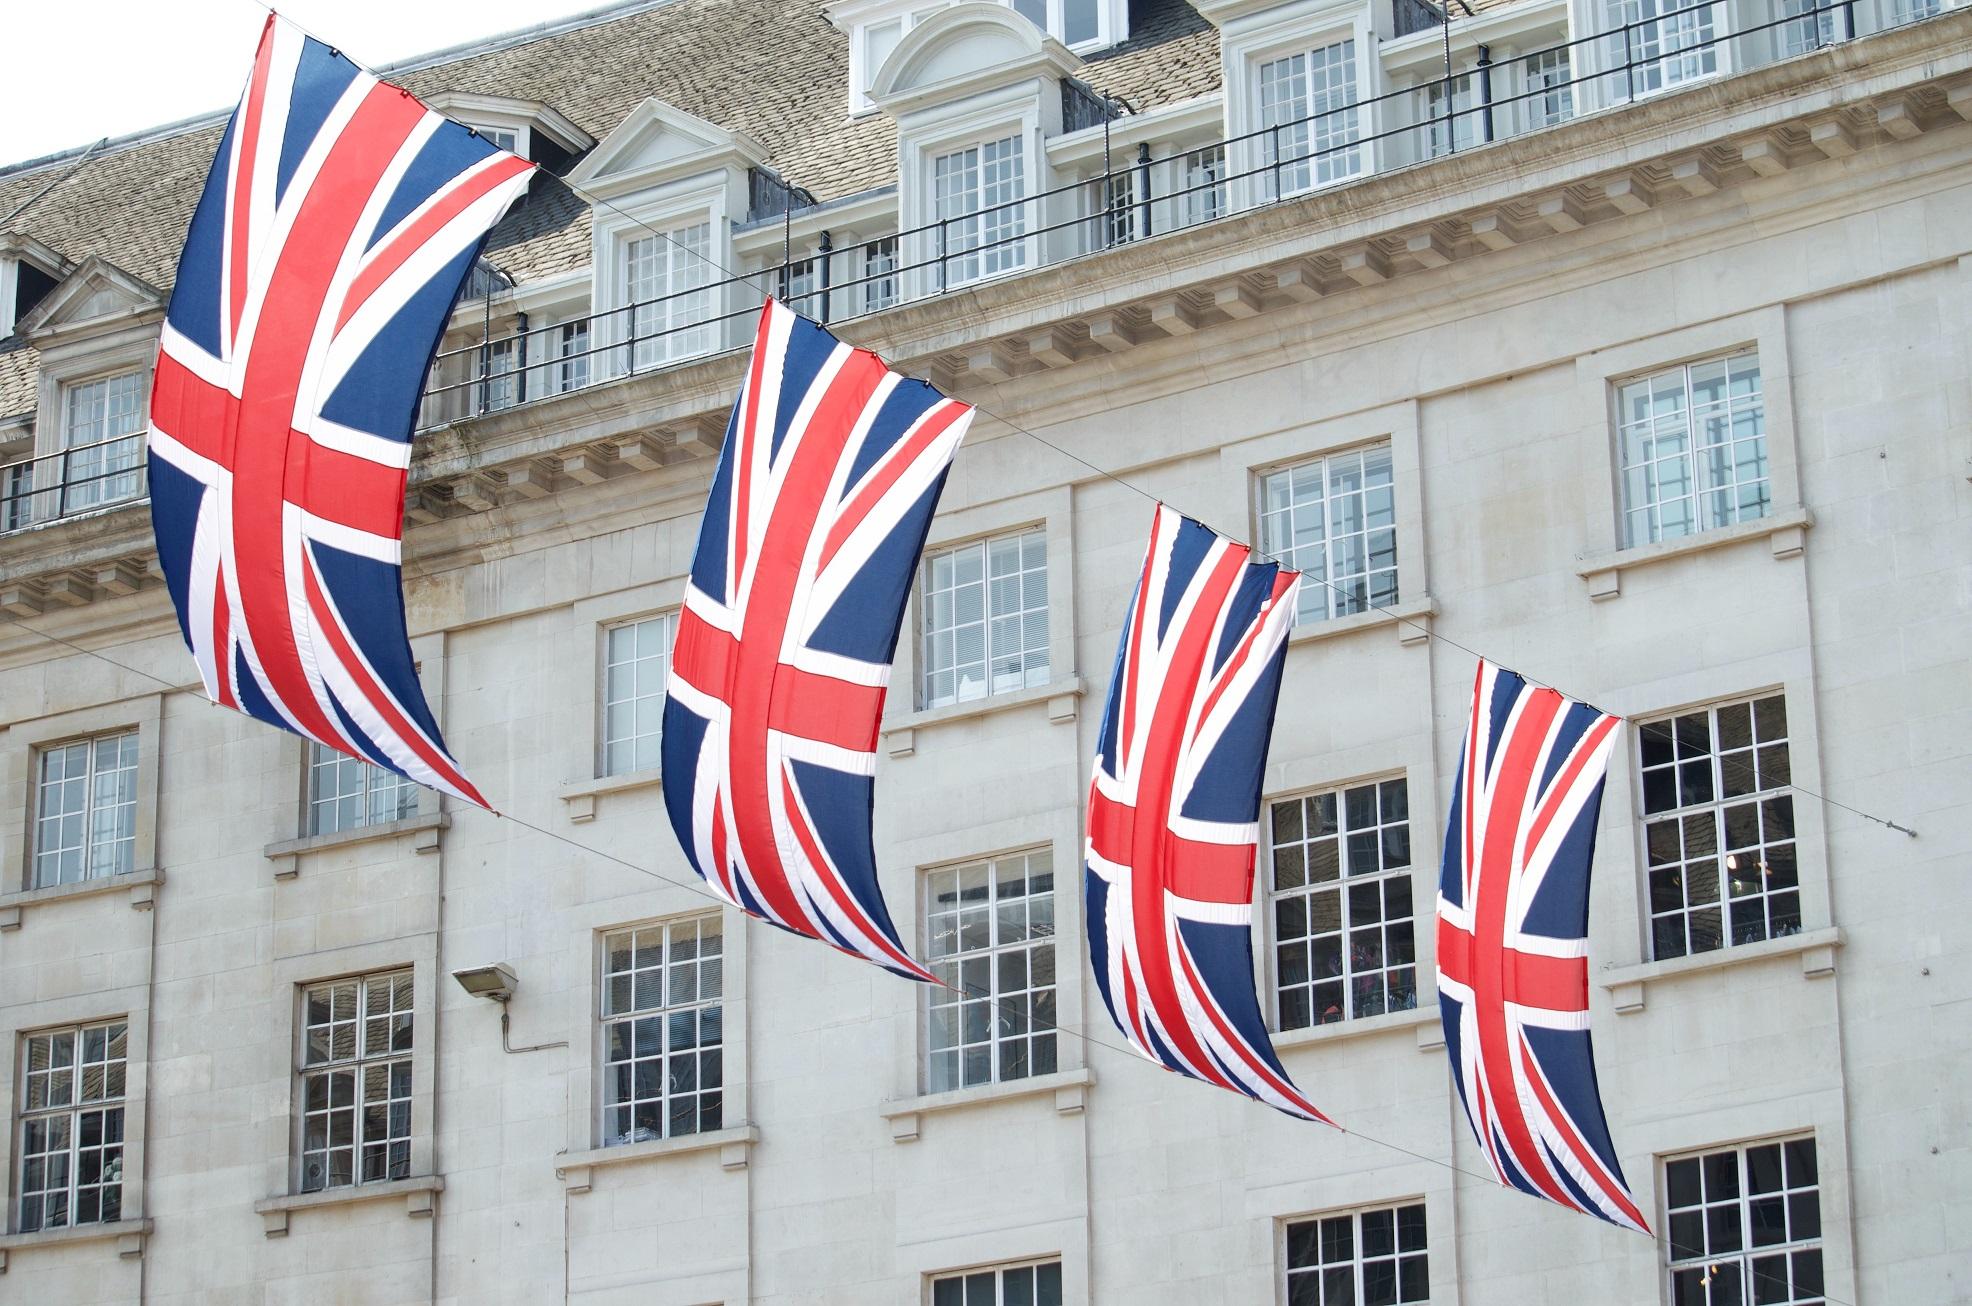 Bank of England. flags.